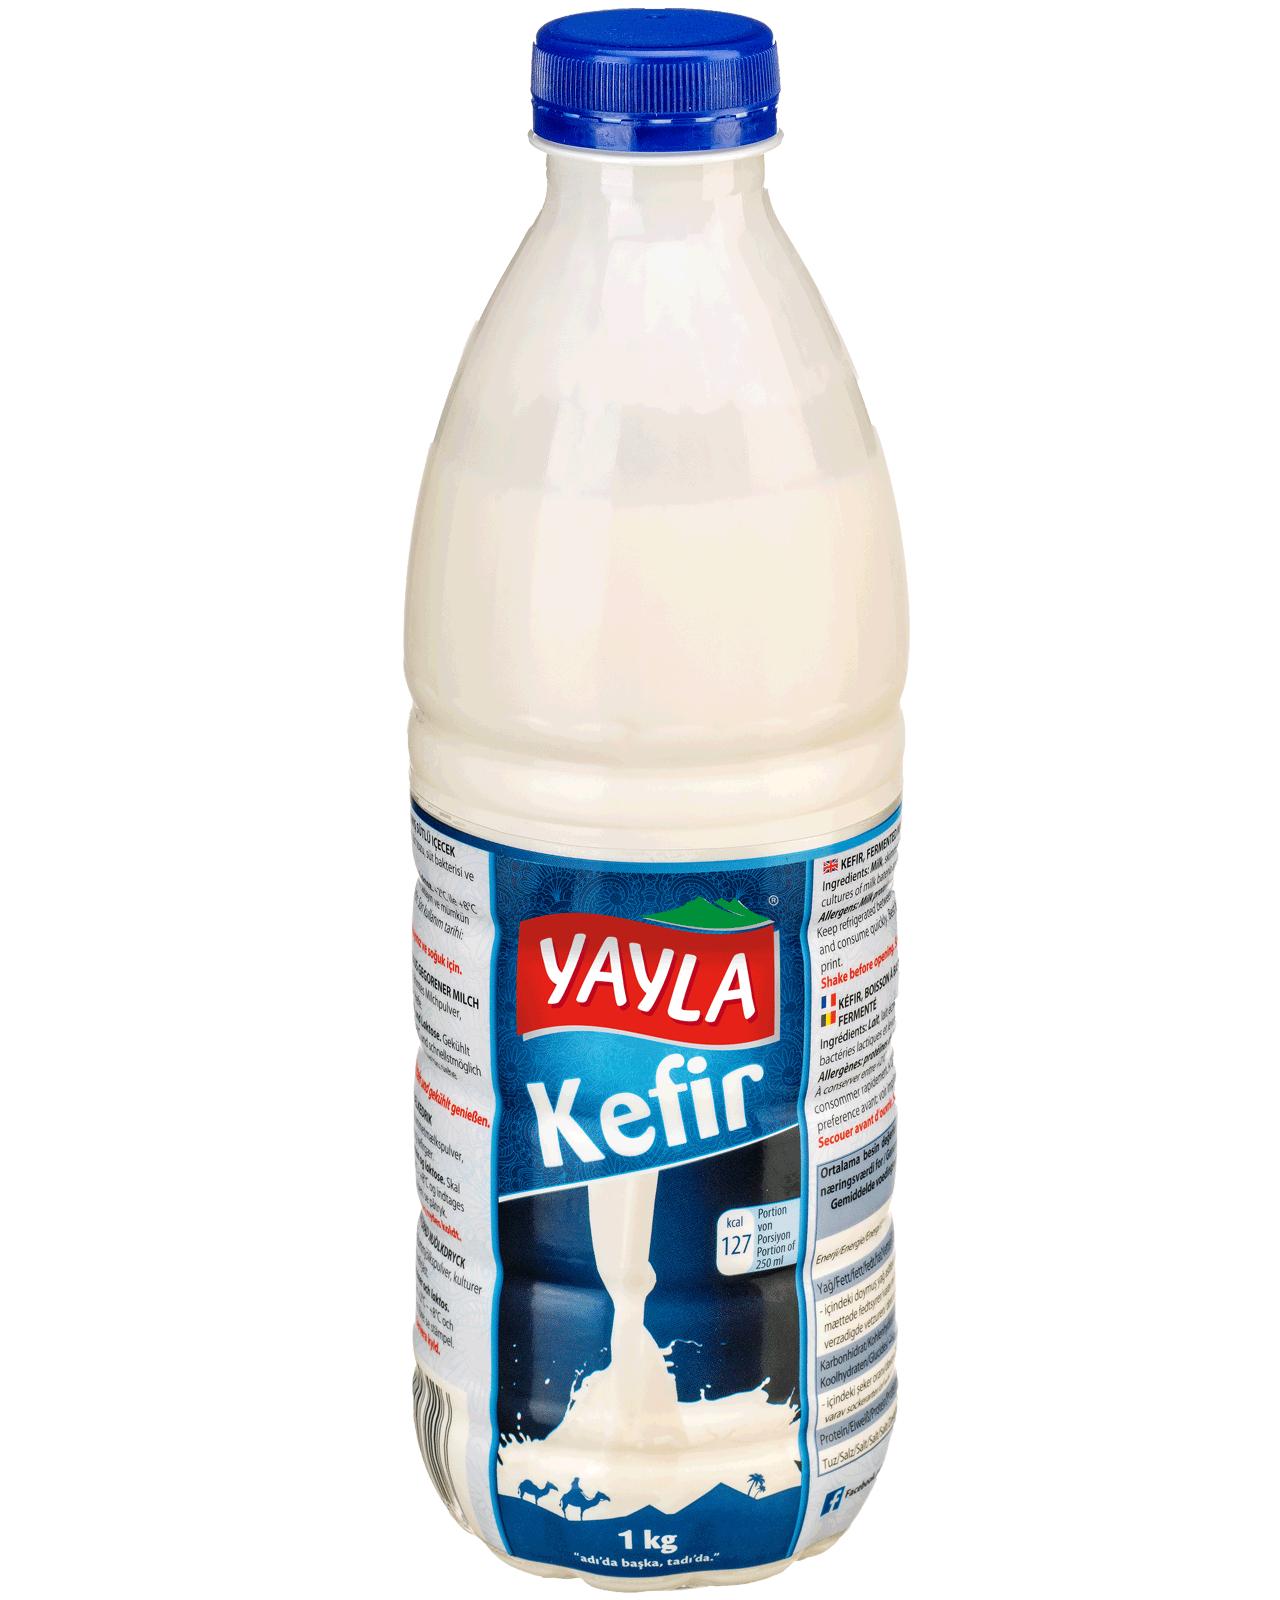 Yayla | Kefir - Getränk aus gegorener Milch